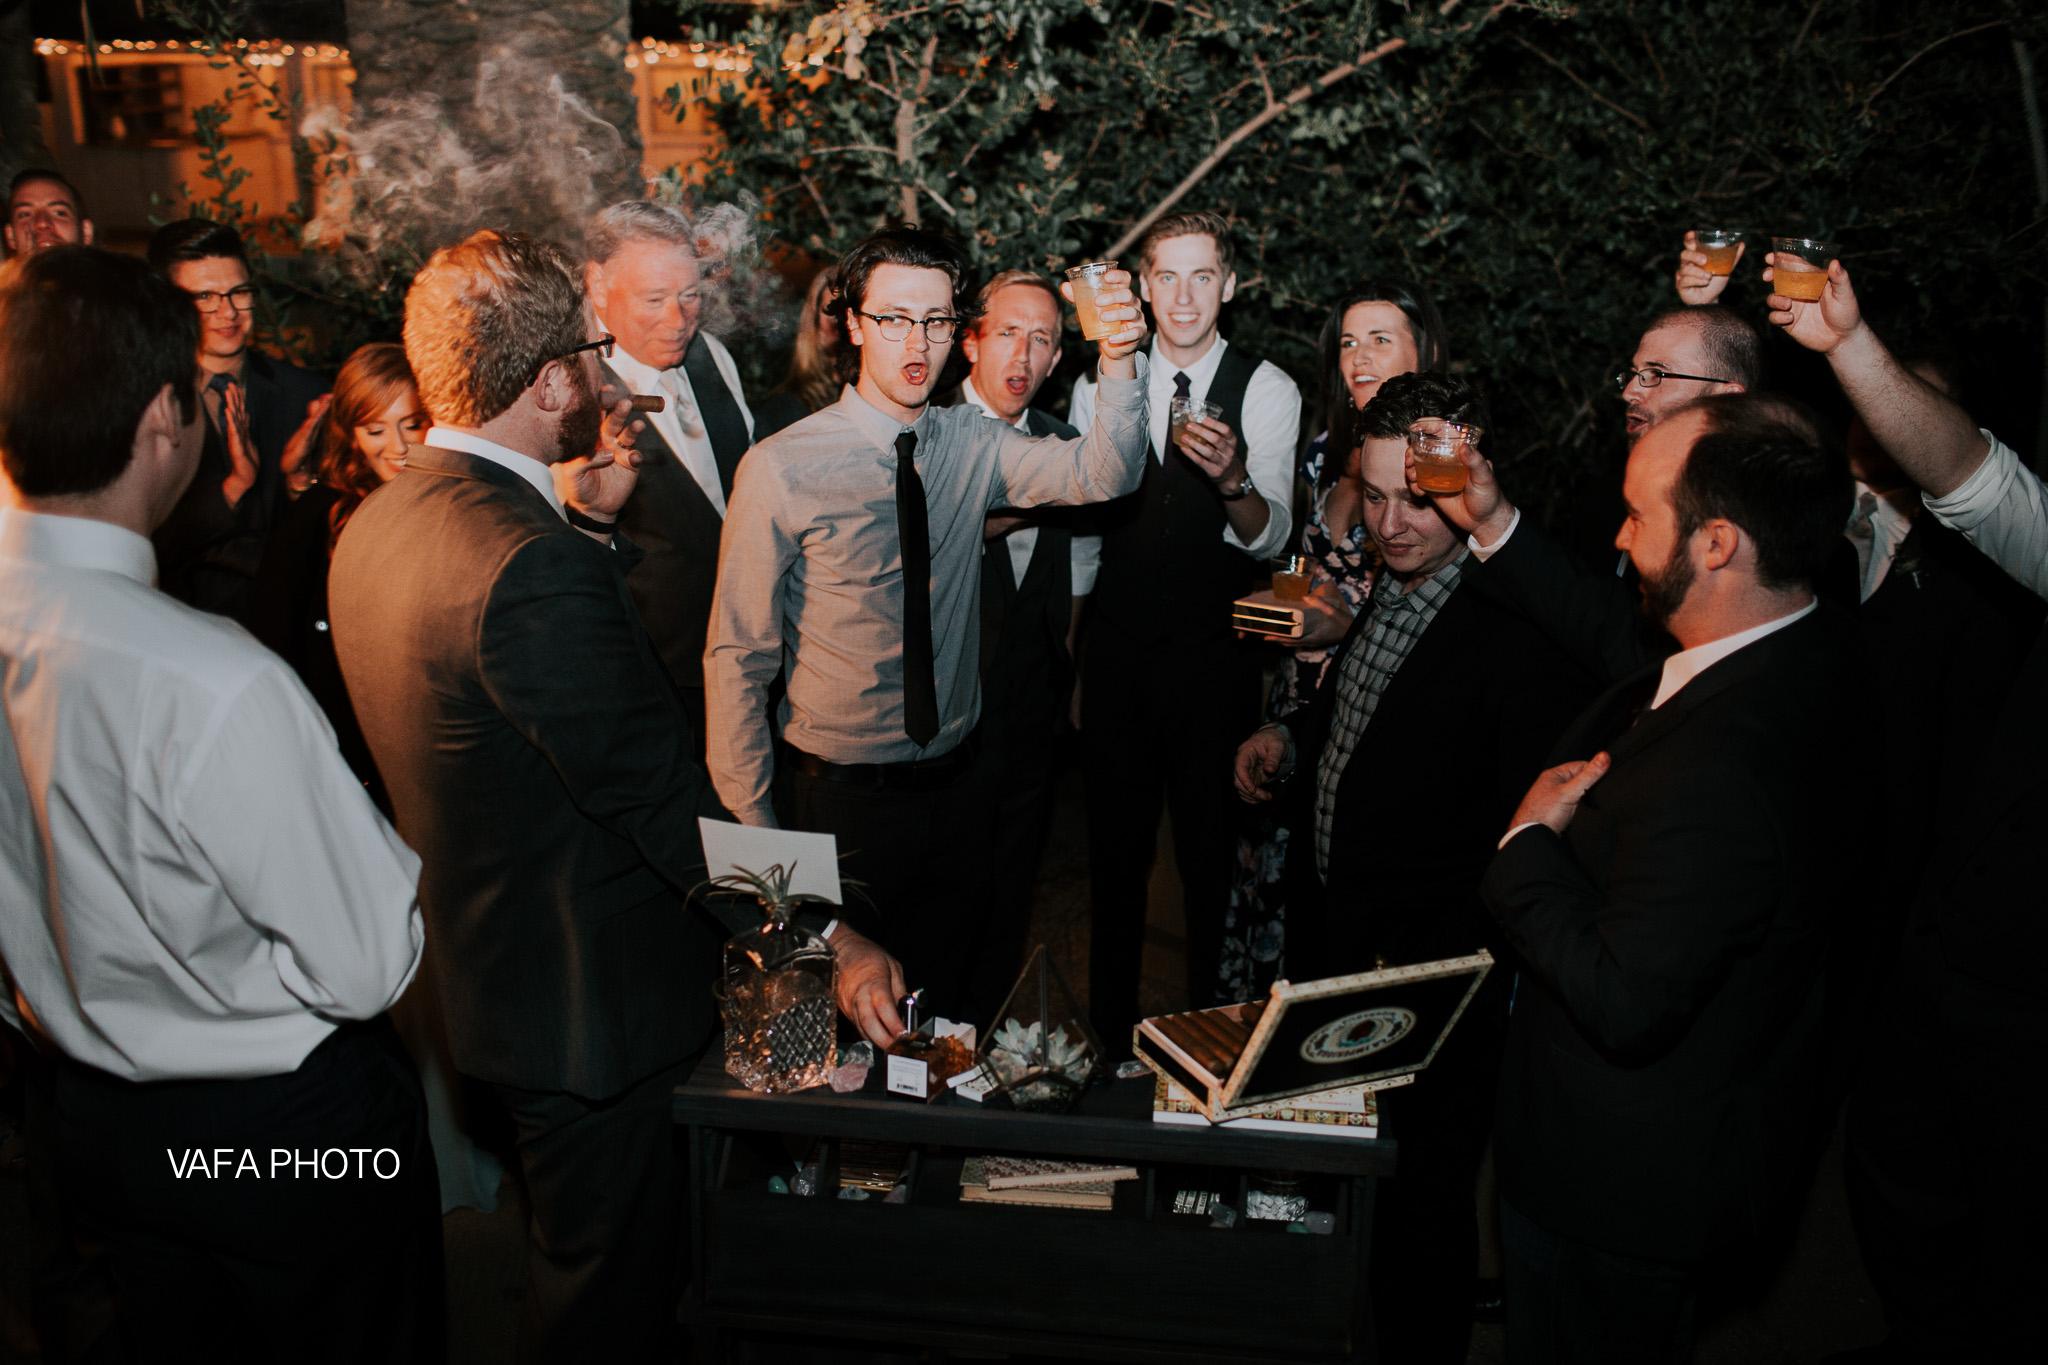 Leo-Carrillo-Ranch-Wedding-Lauren-Mike-Vafa-Photo-1106.jpg